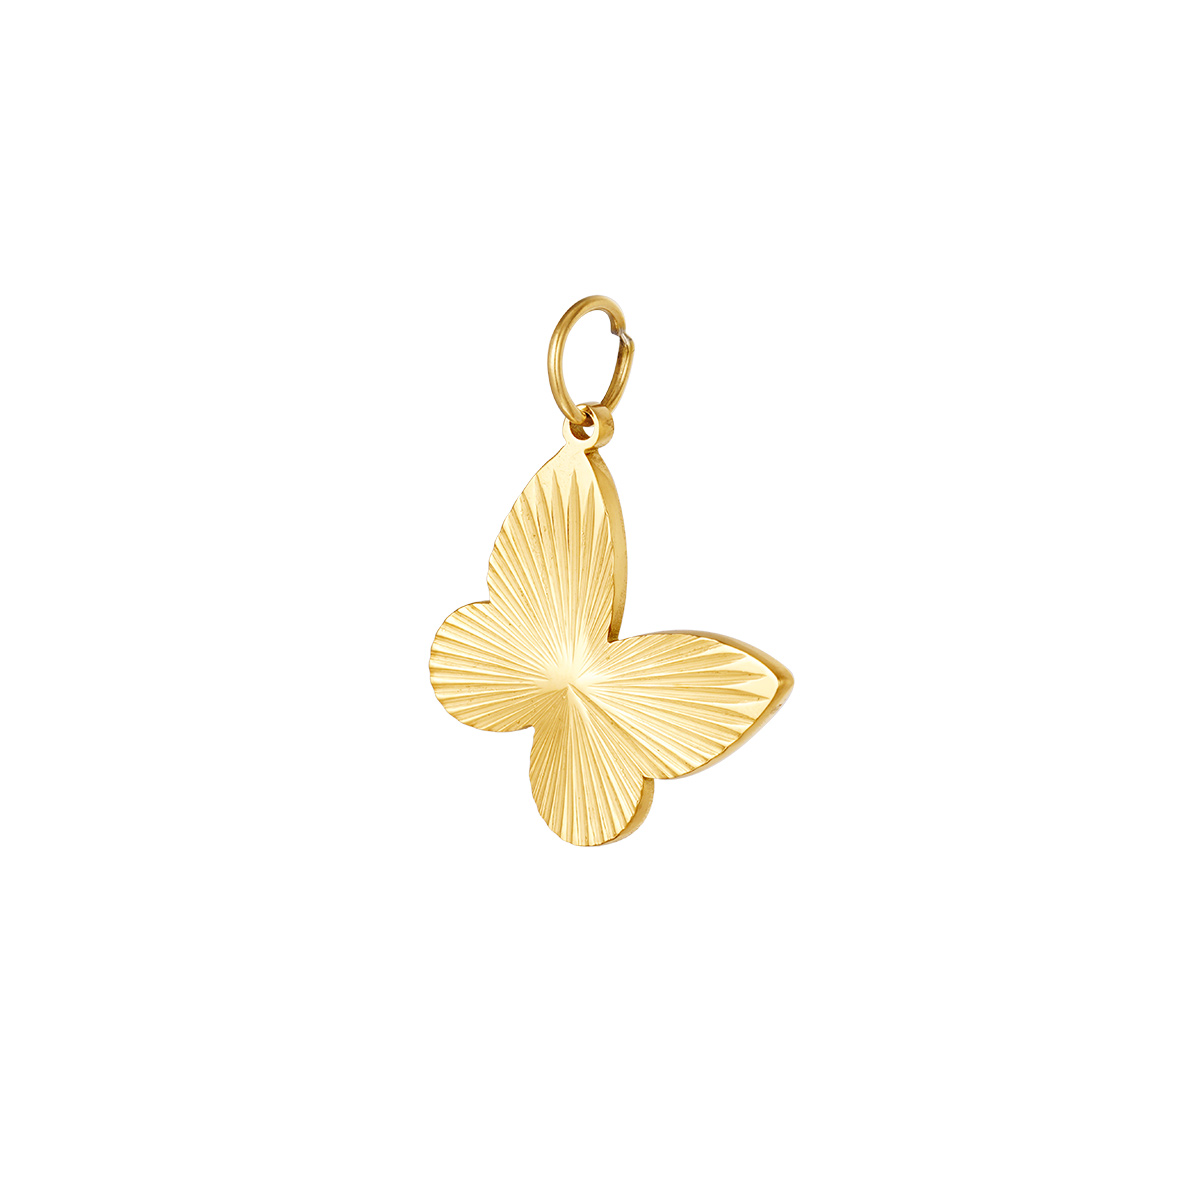 Dije de mariposa de acero inoxidable DIY